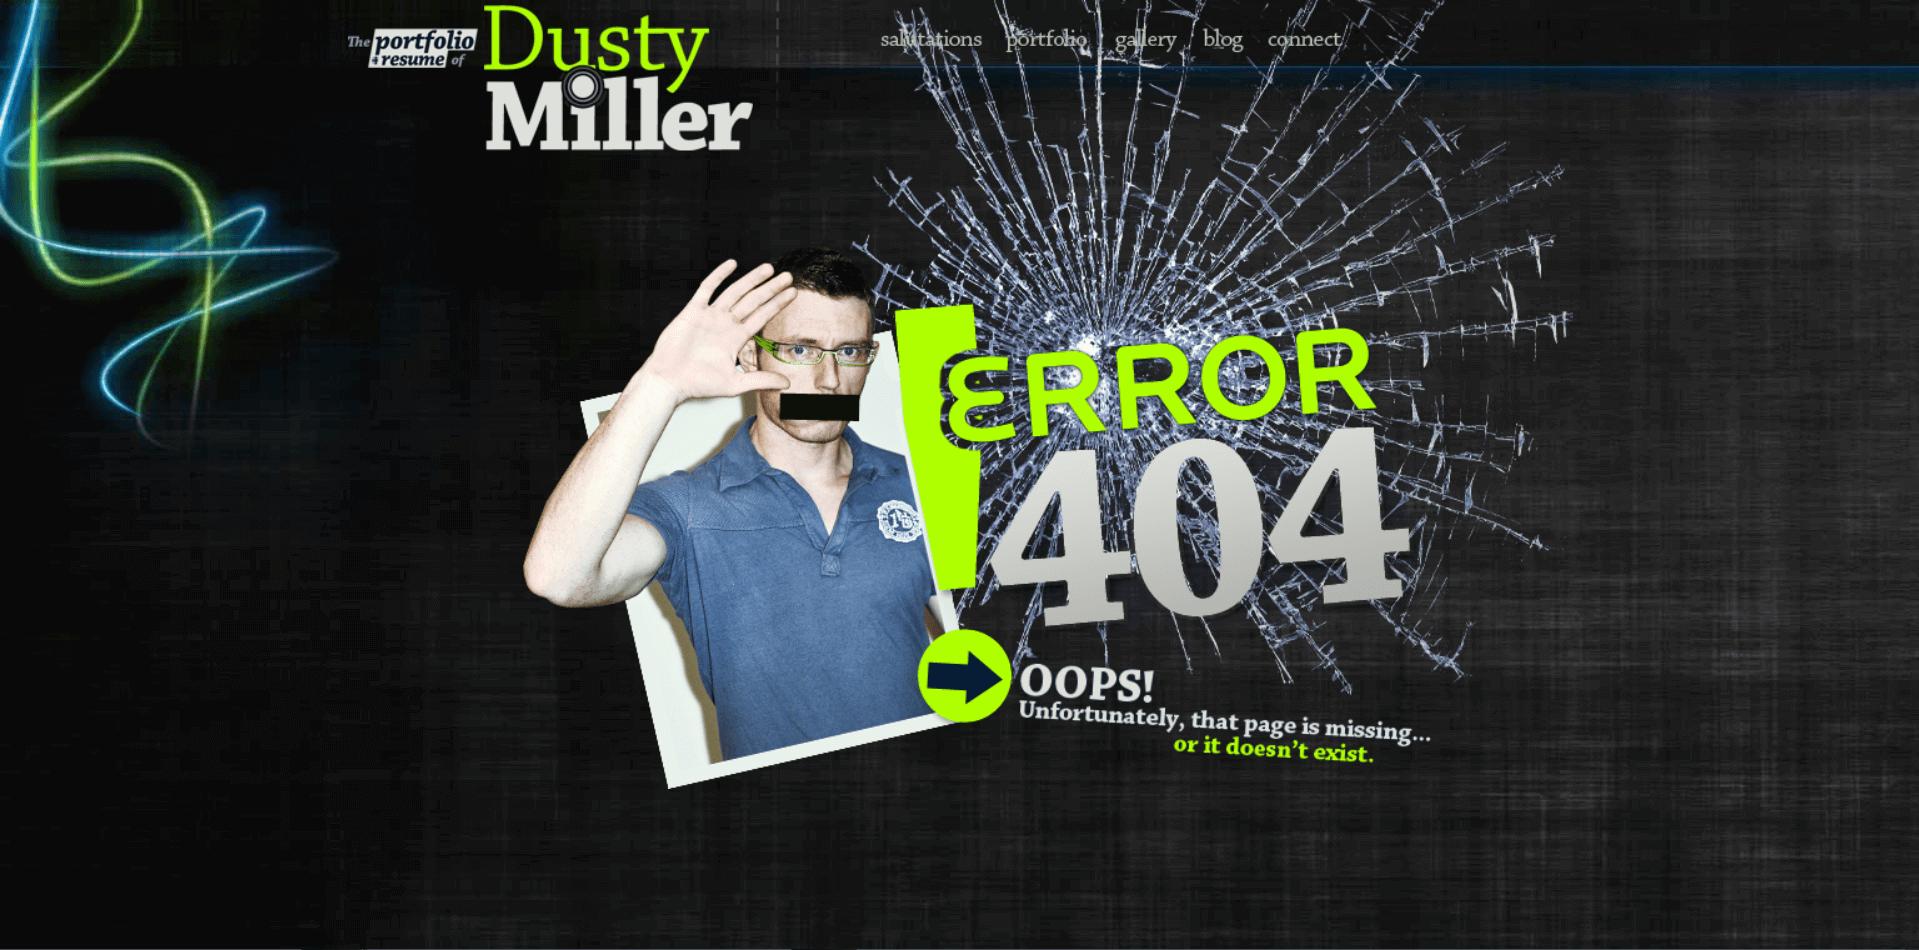 DustyMiller.ca